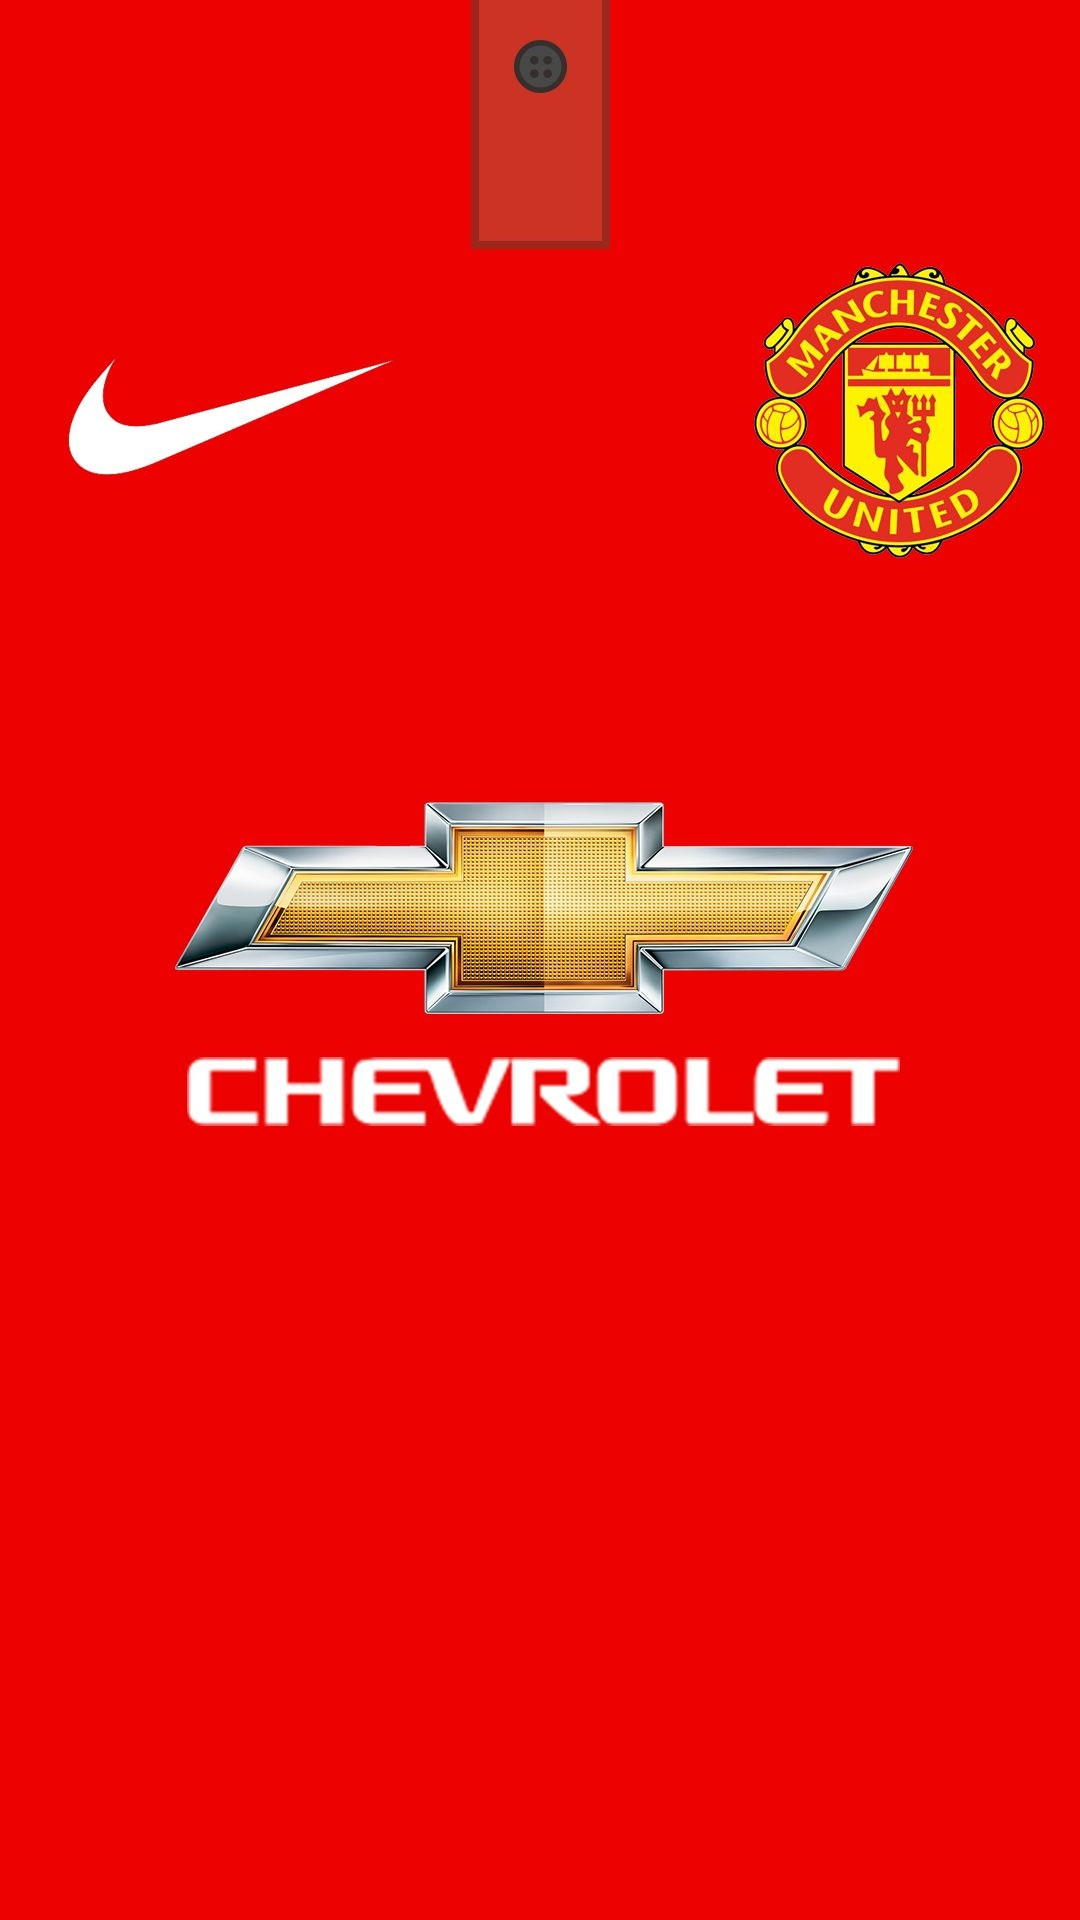 Manchester United New Kit Wallpaper Logo Manchester United